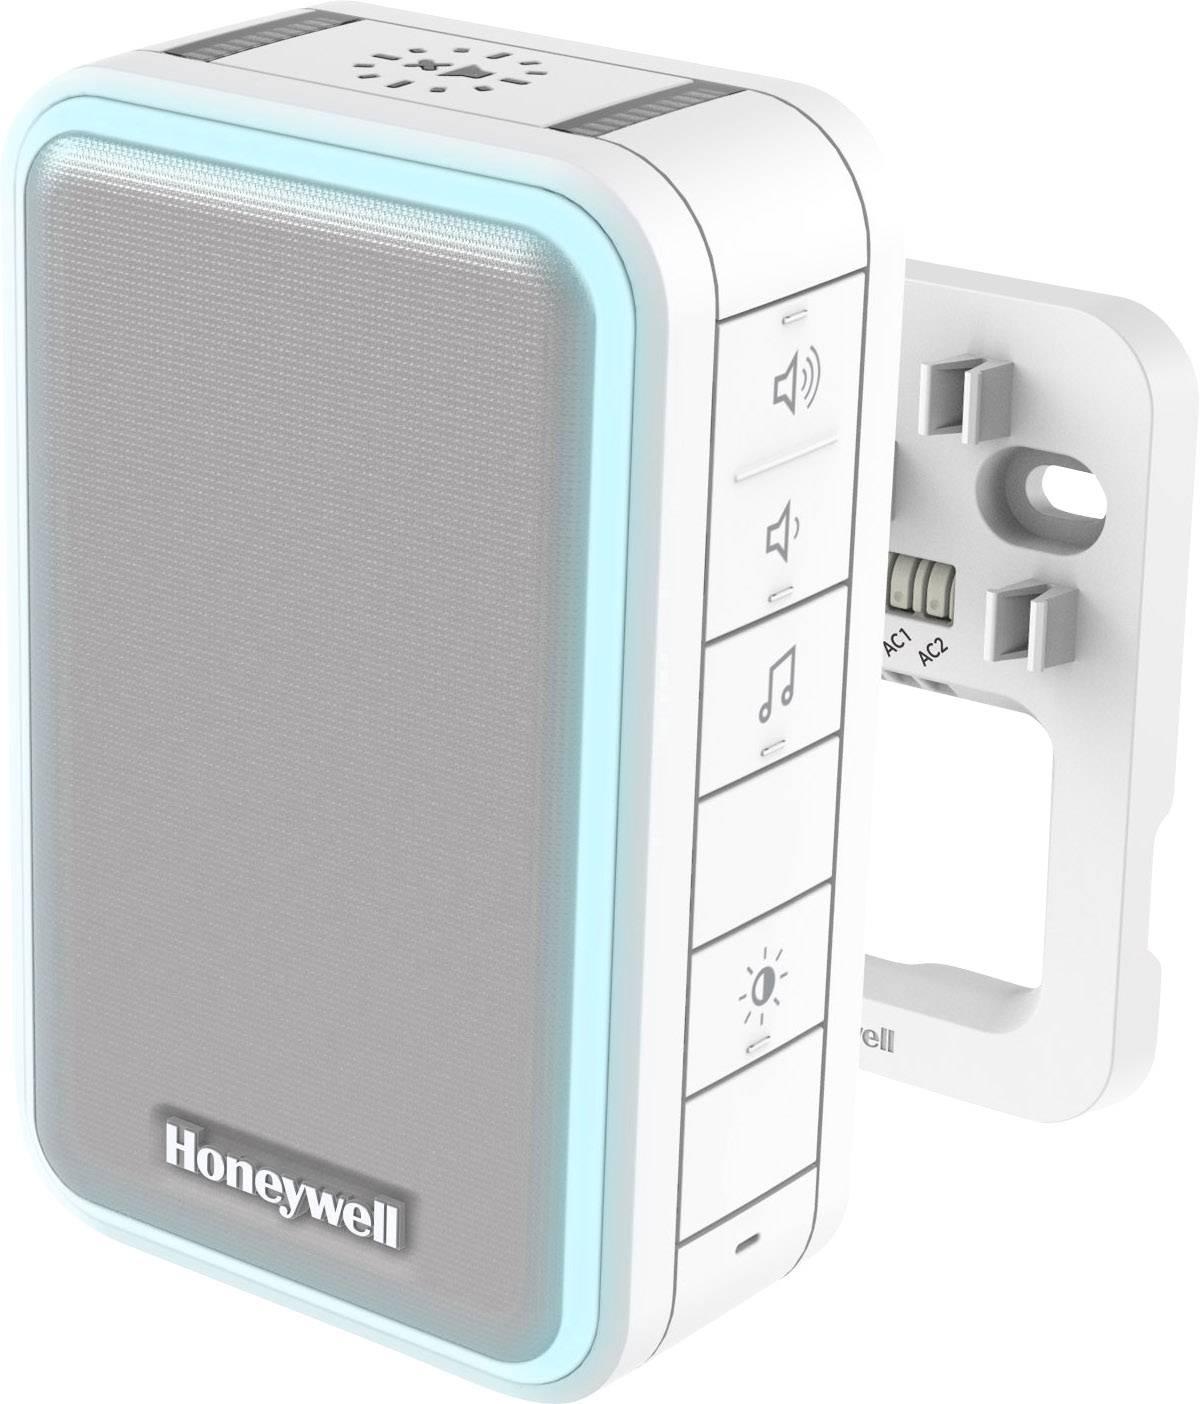 Honeywell Home DW315S Suoneria